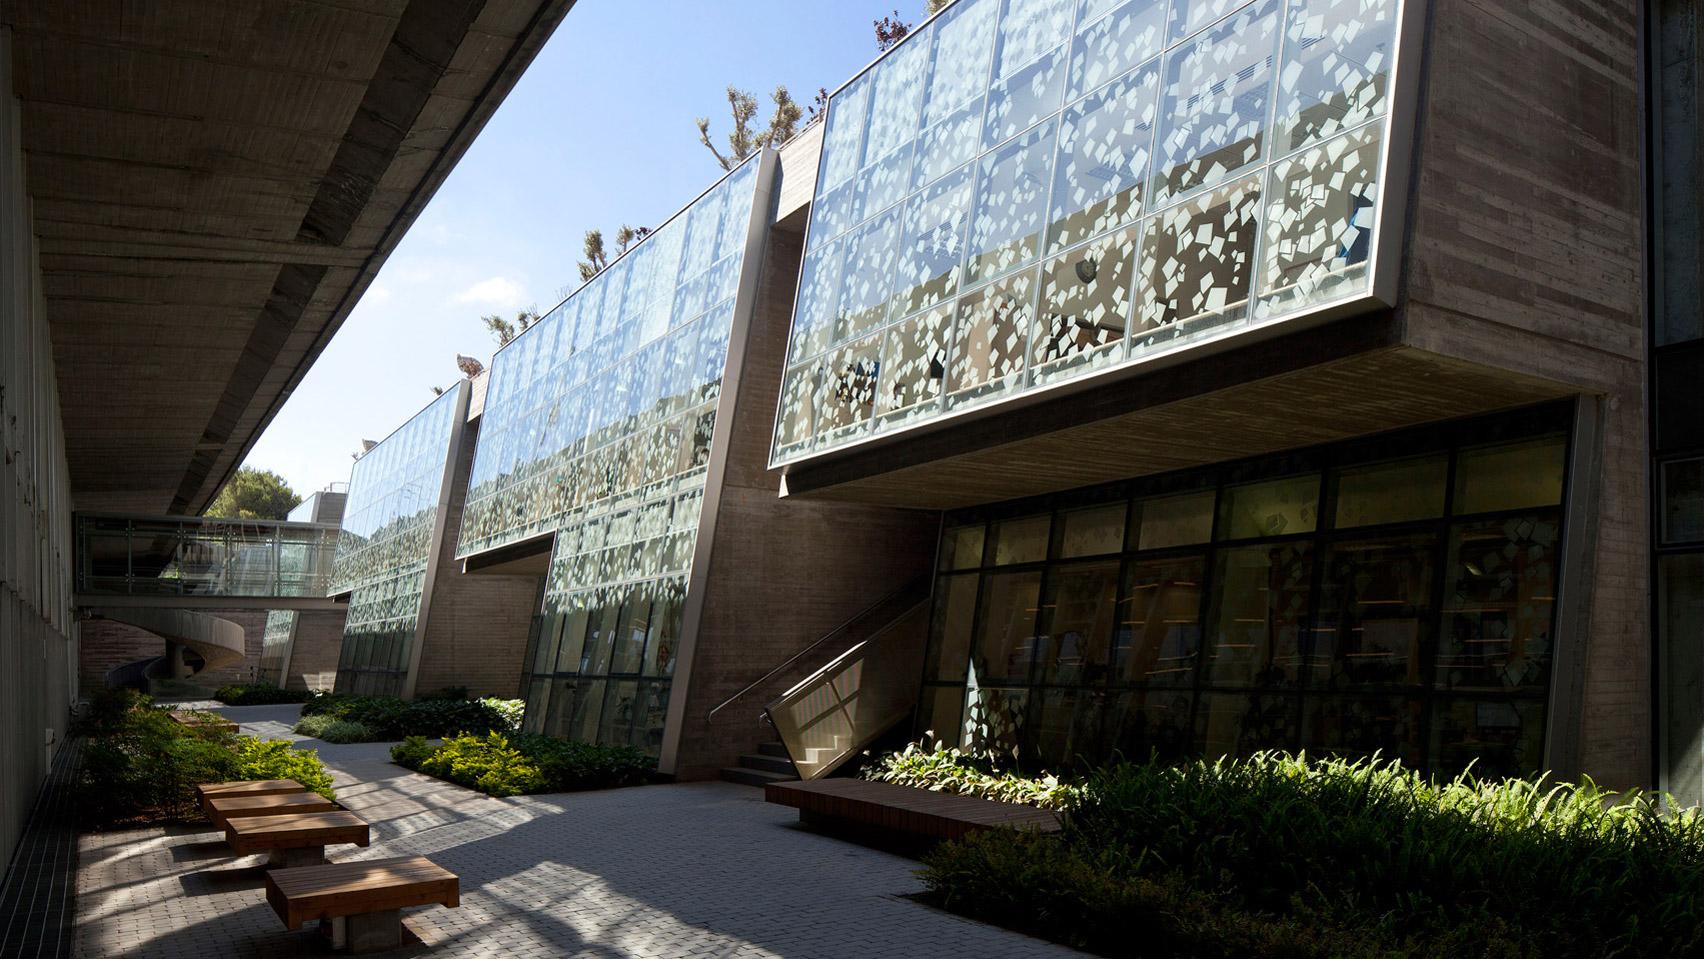 Haifa University Library by Oscar Niemeyer